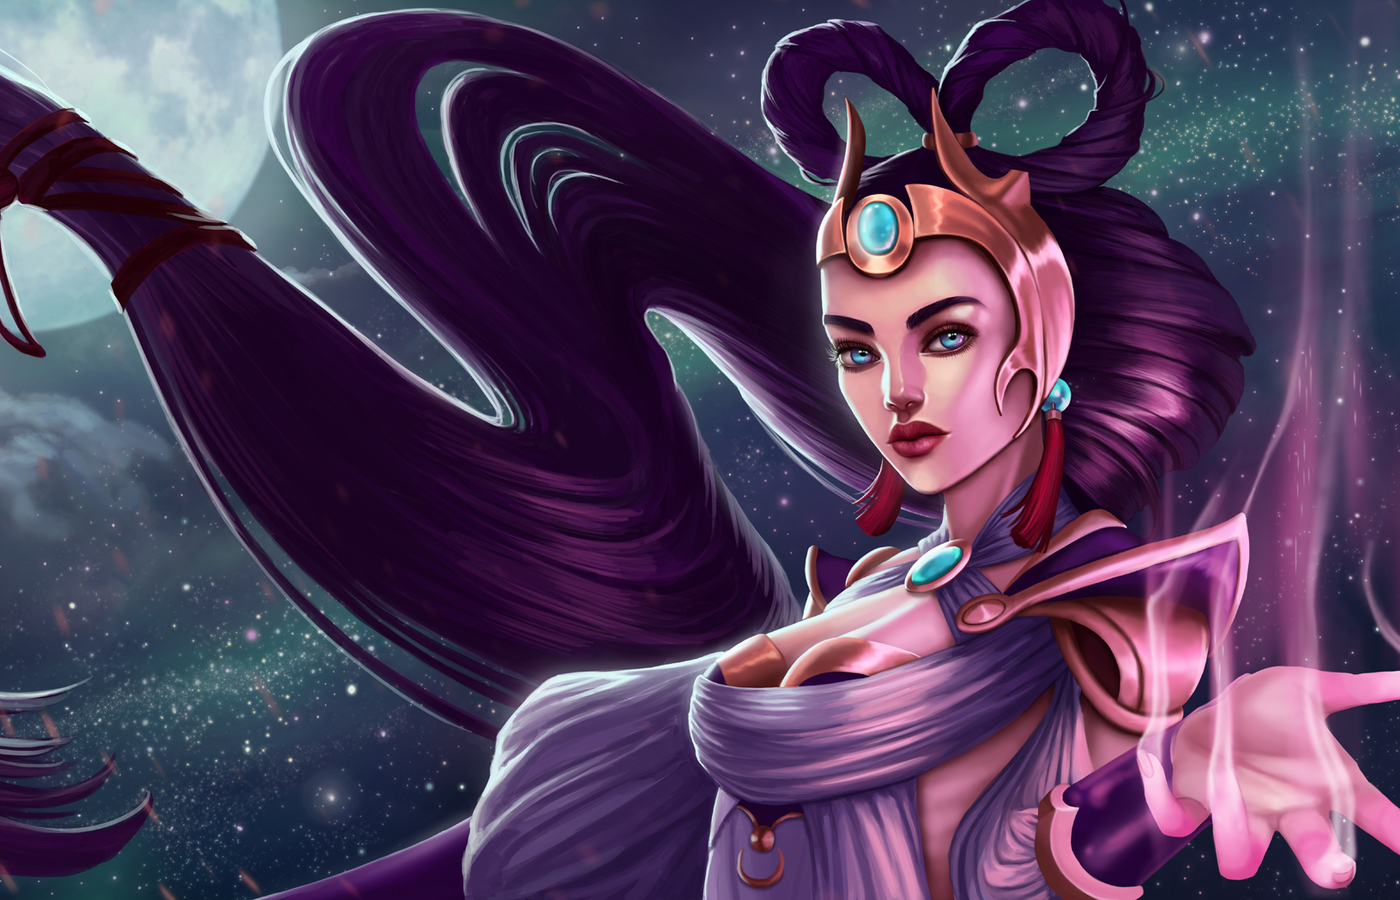 diana-league-of-legends-fantasy-girl-ds.jpg